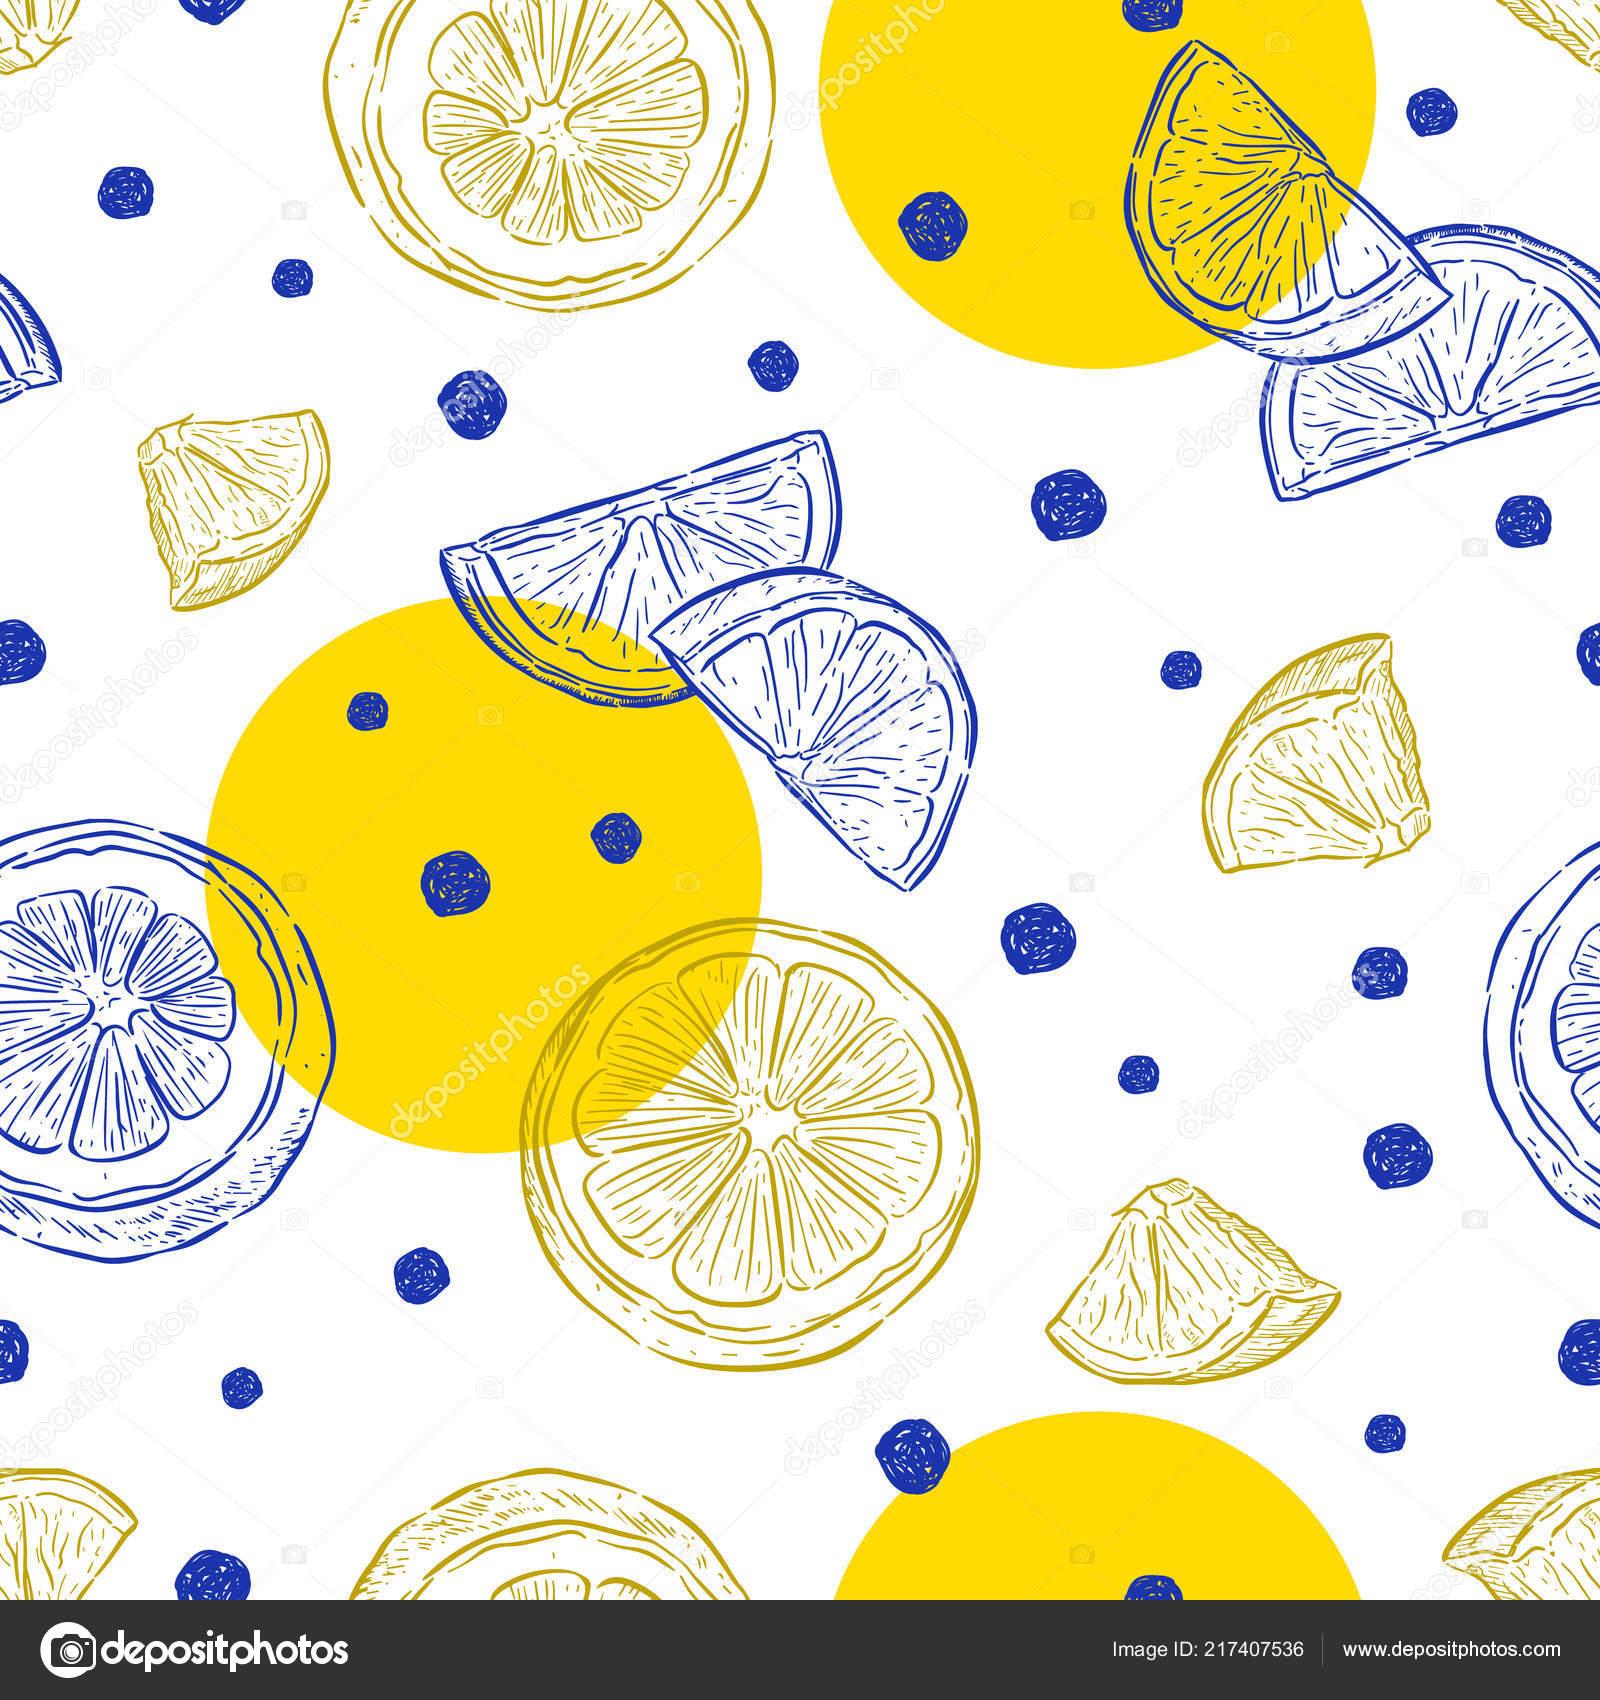 Cerstve Citrony Pozadi Rucne Kreslene Barevny Vzor Bezesve Cerstveho